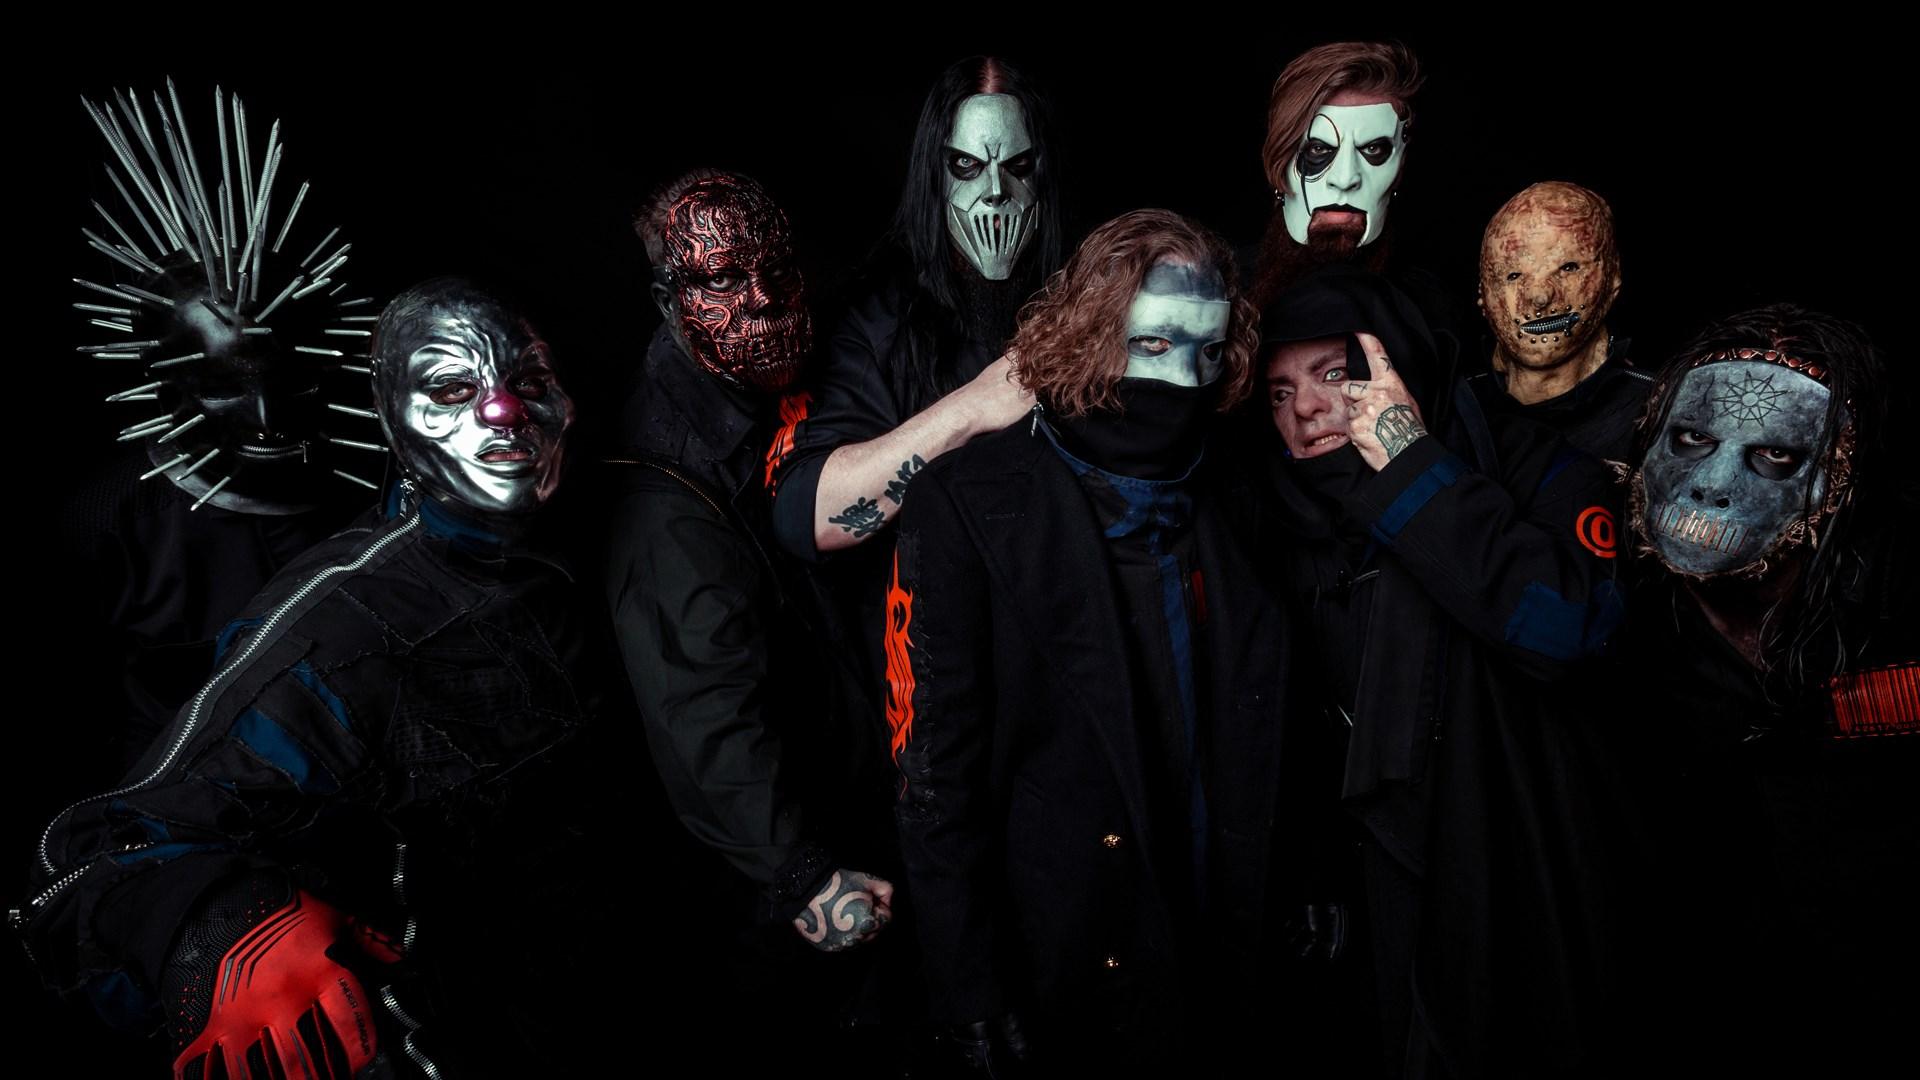 Slipknot am 14. February 2020 @ Wiener Stadthalle - Halle D.